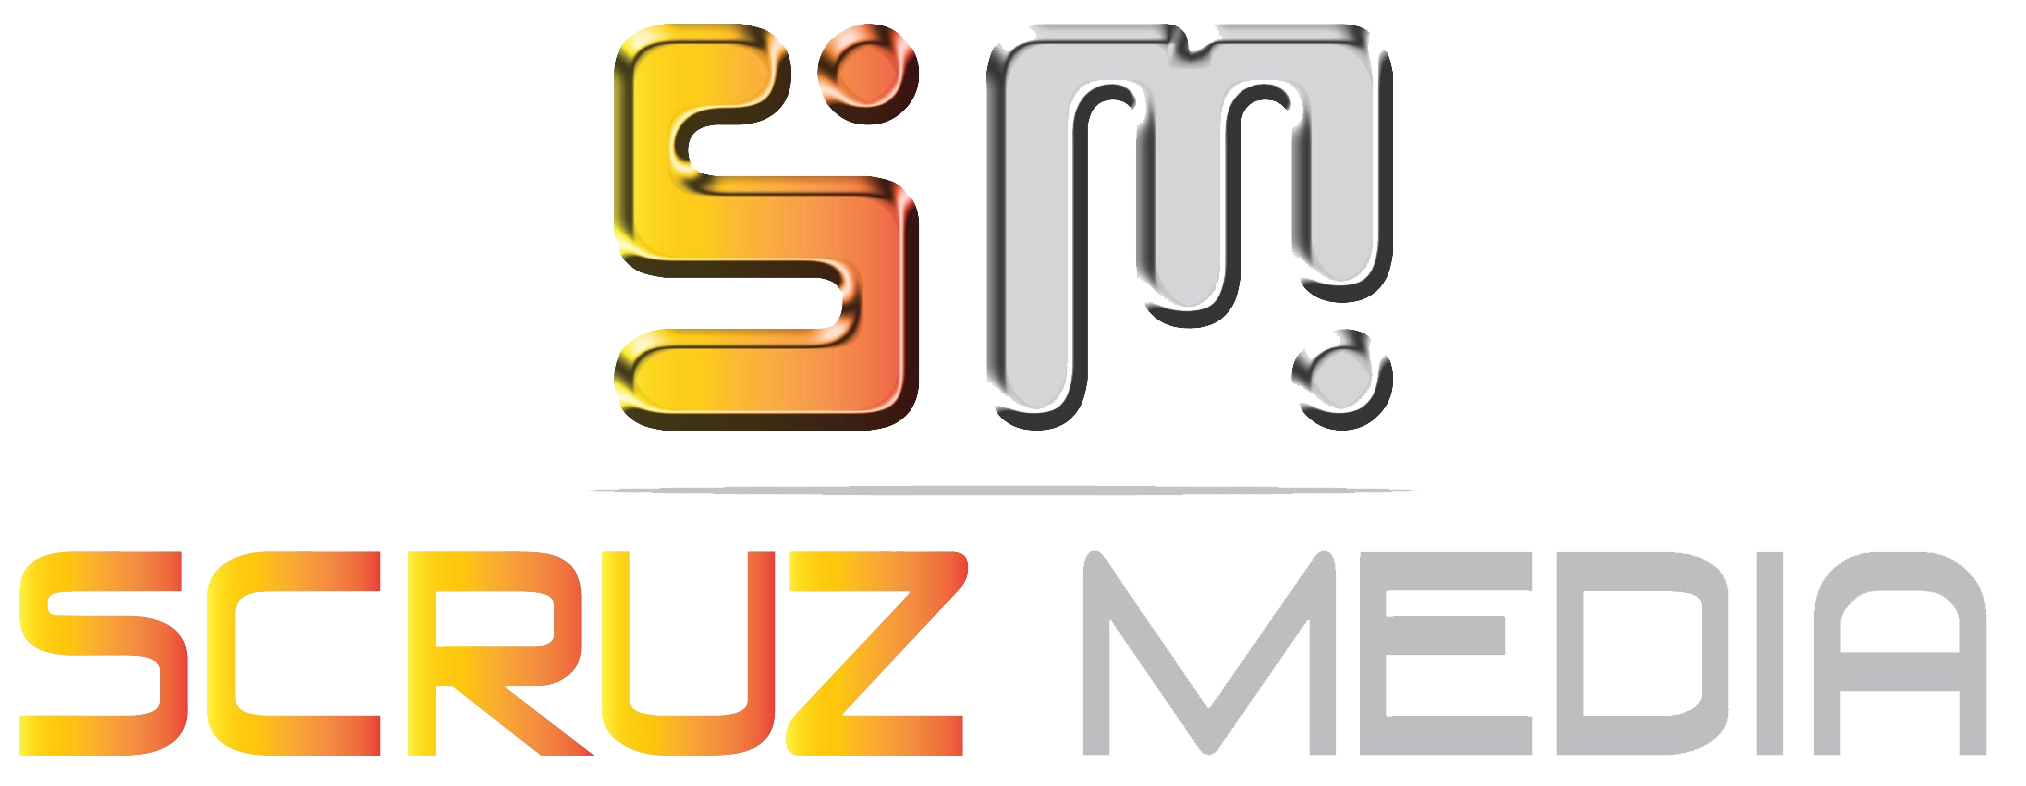 Drivers license clipart surname. Scruz media promotions